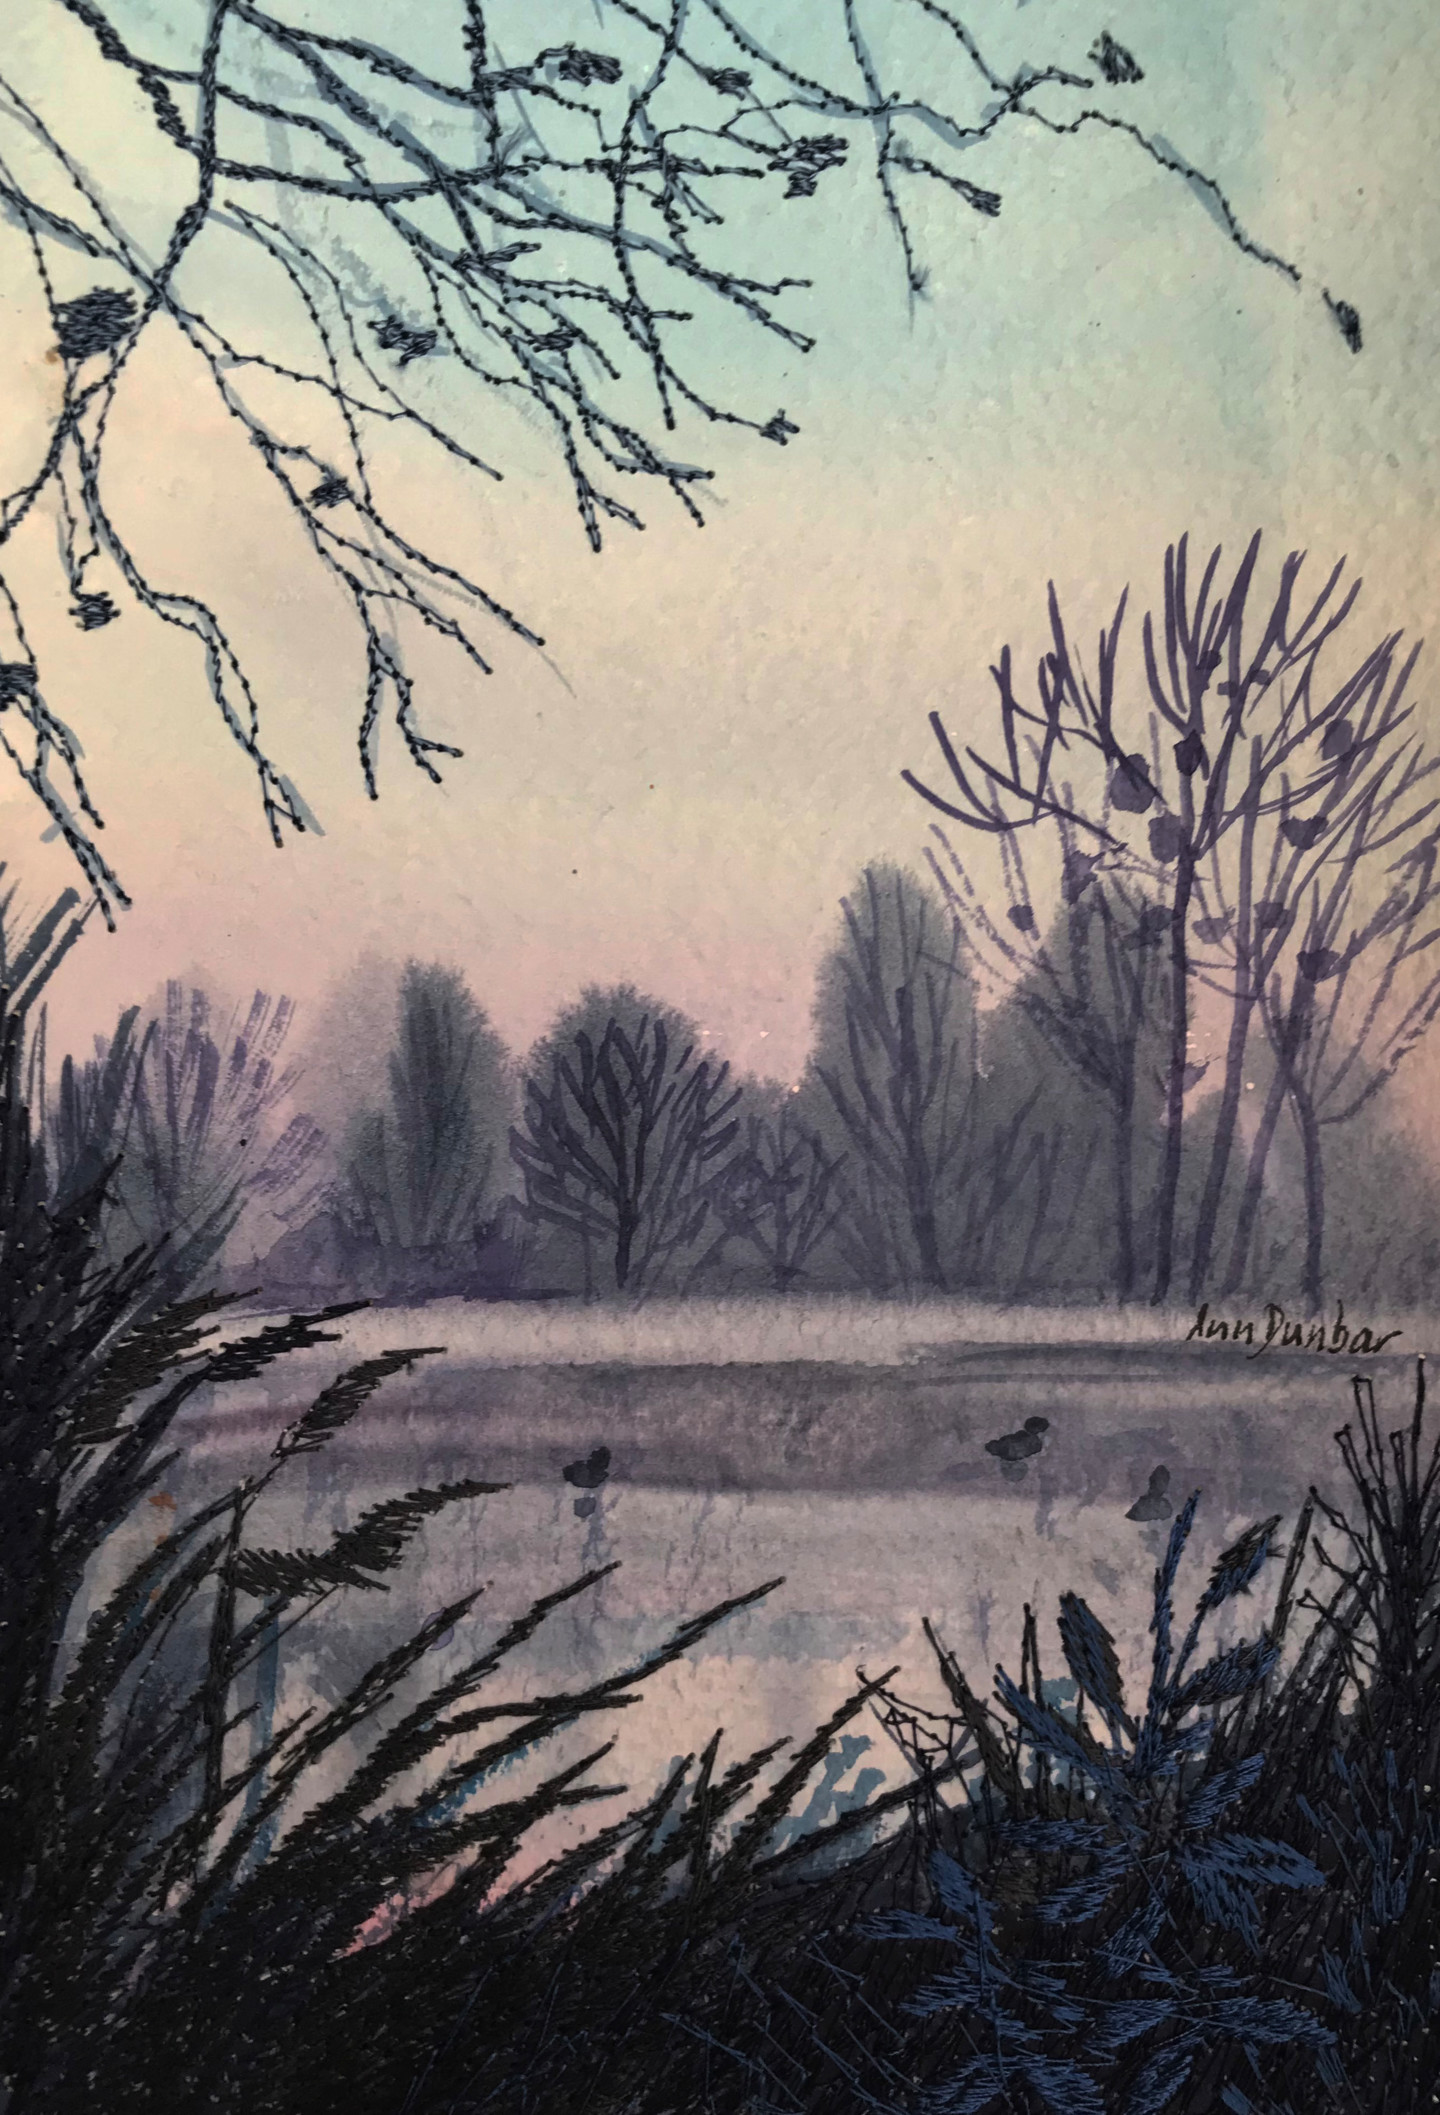 Ann Dunbar - Stillness is the Altar of the Spirit